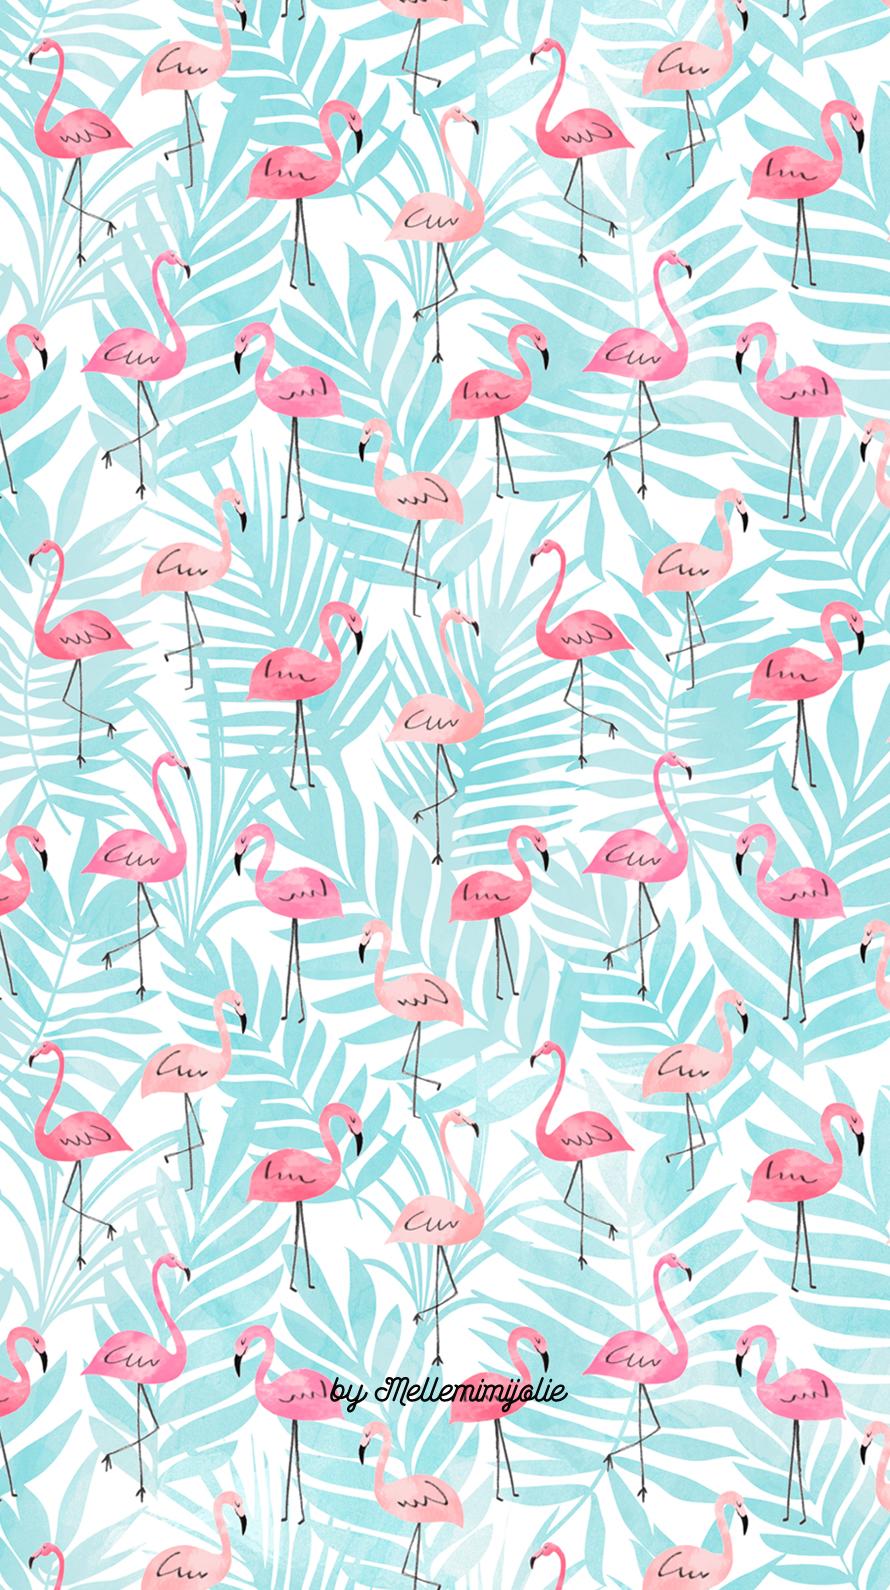 Christmas Wallpaper Iphone 6 Flamingo Wallpaper Mellemimijolie